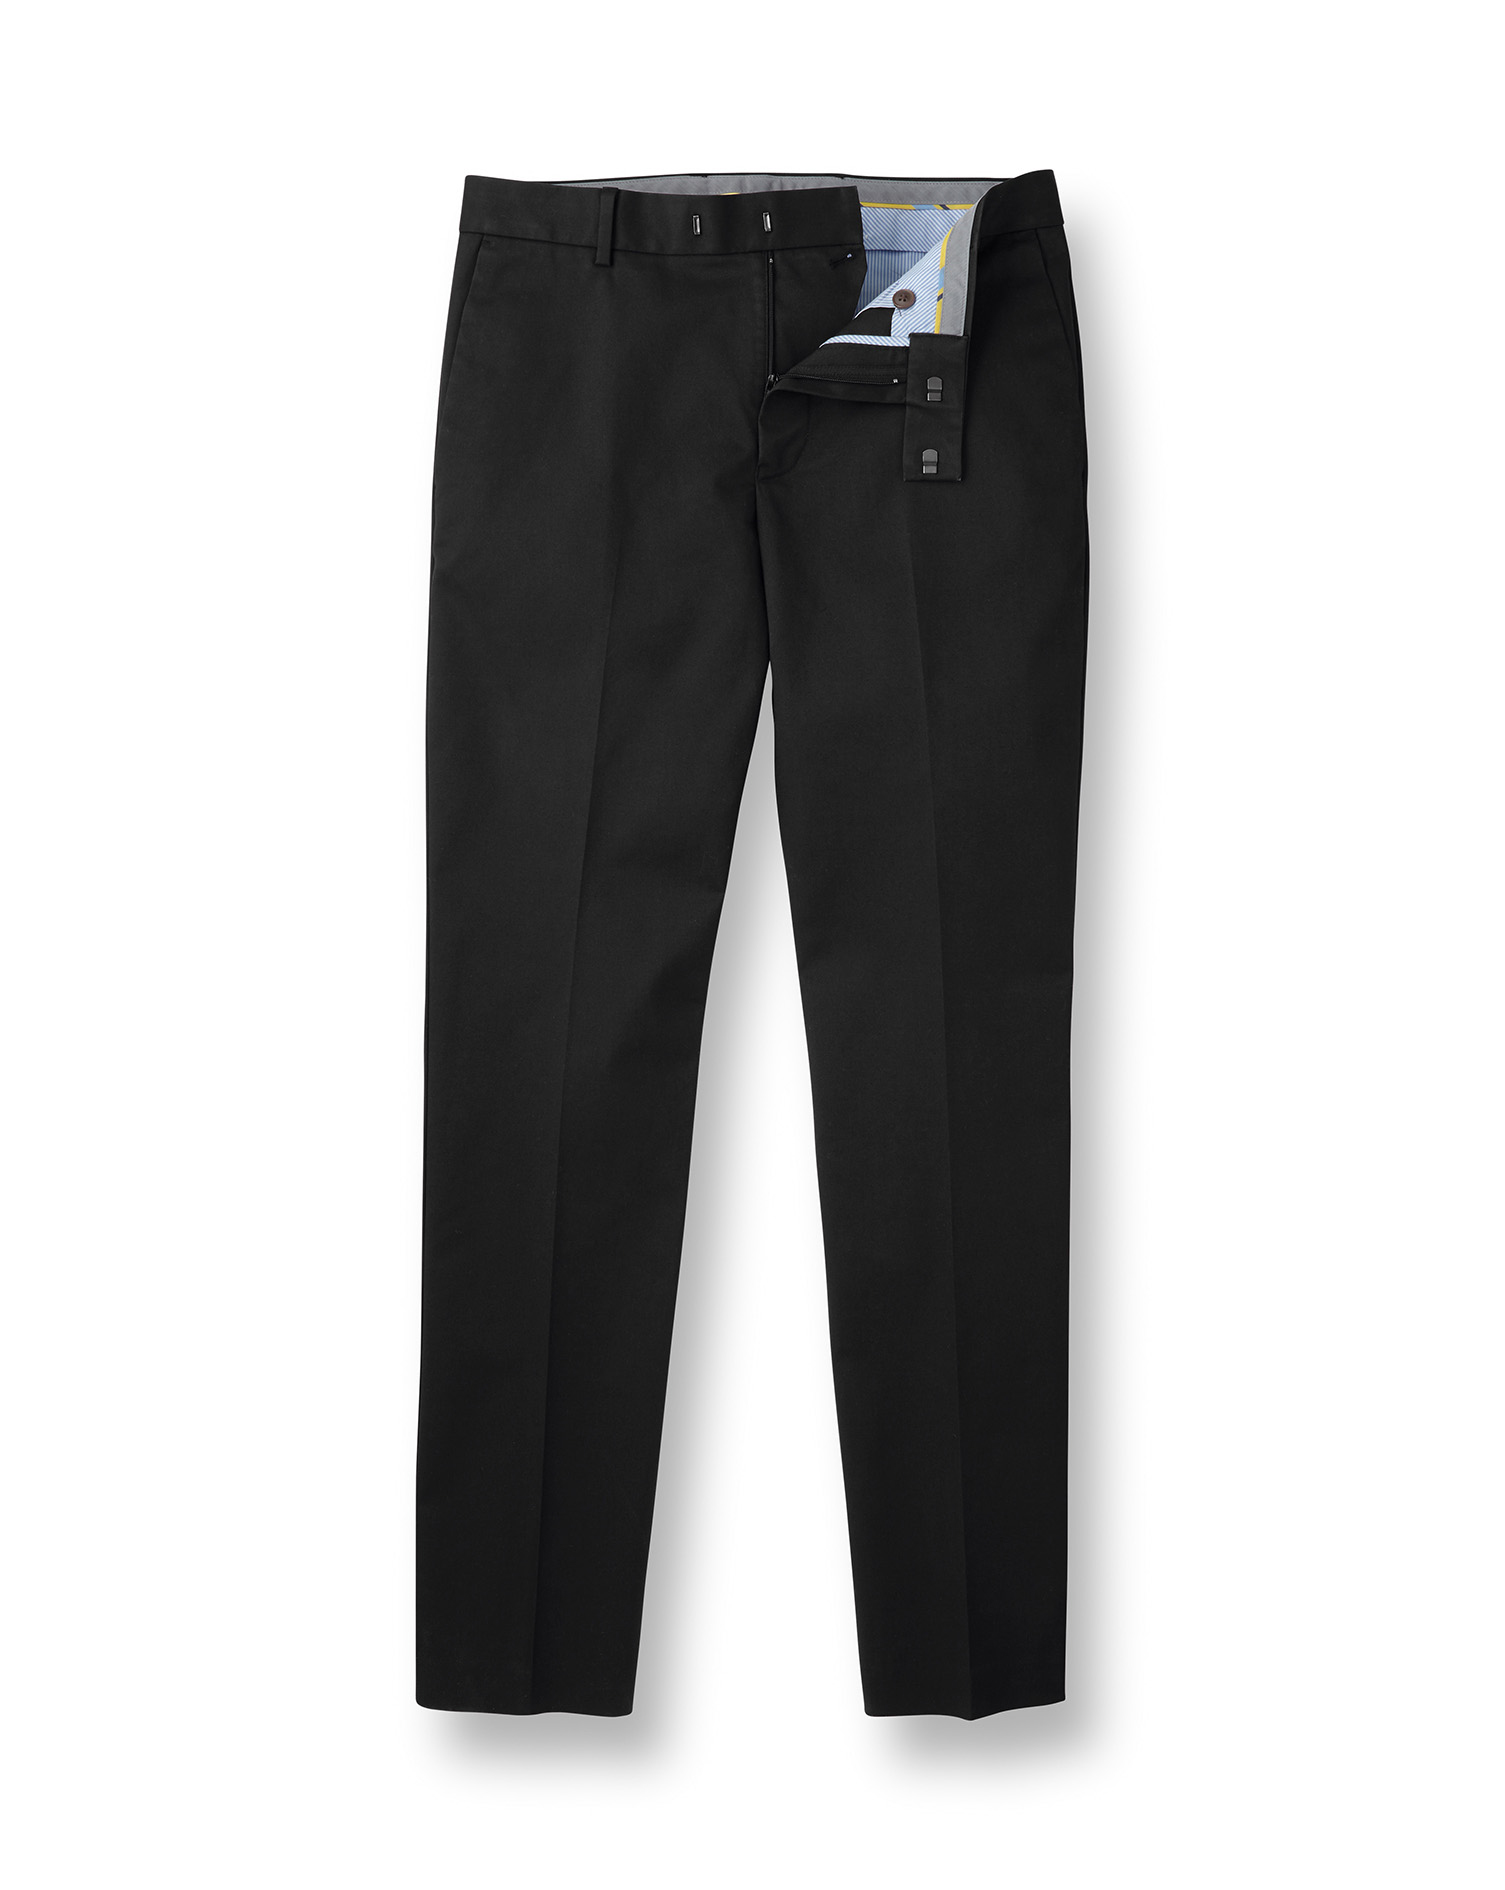 Cotton Black Flat Front Non-Iron Chinos